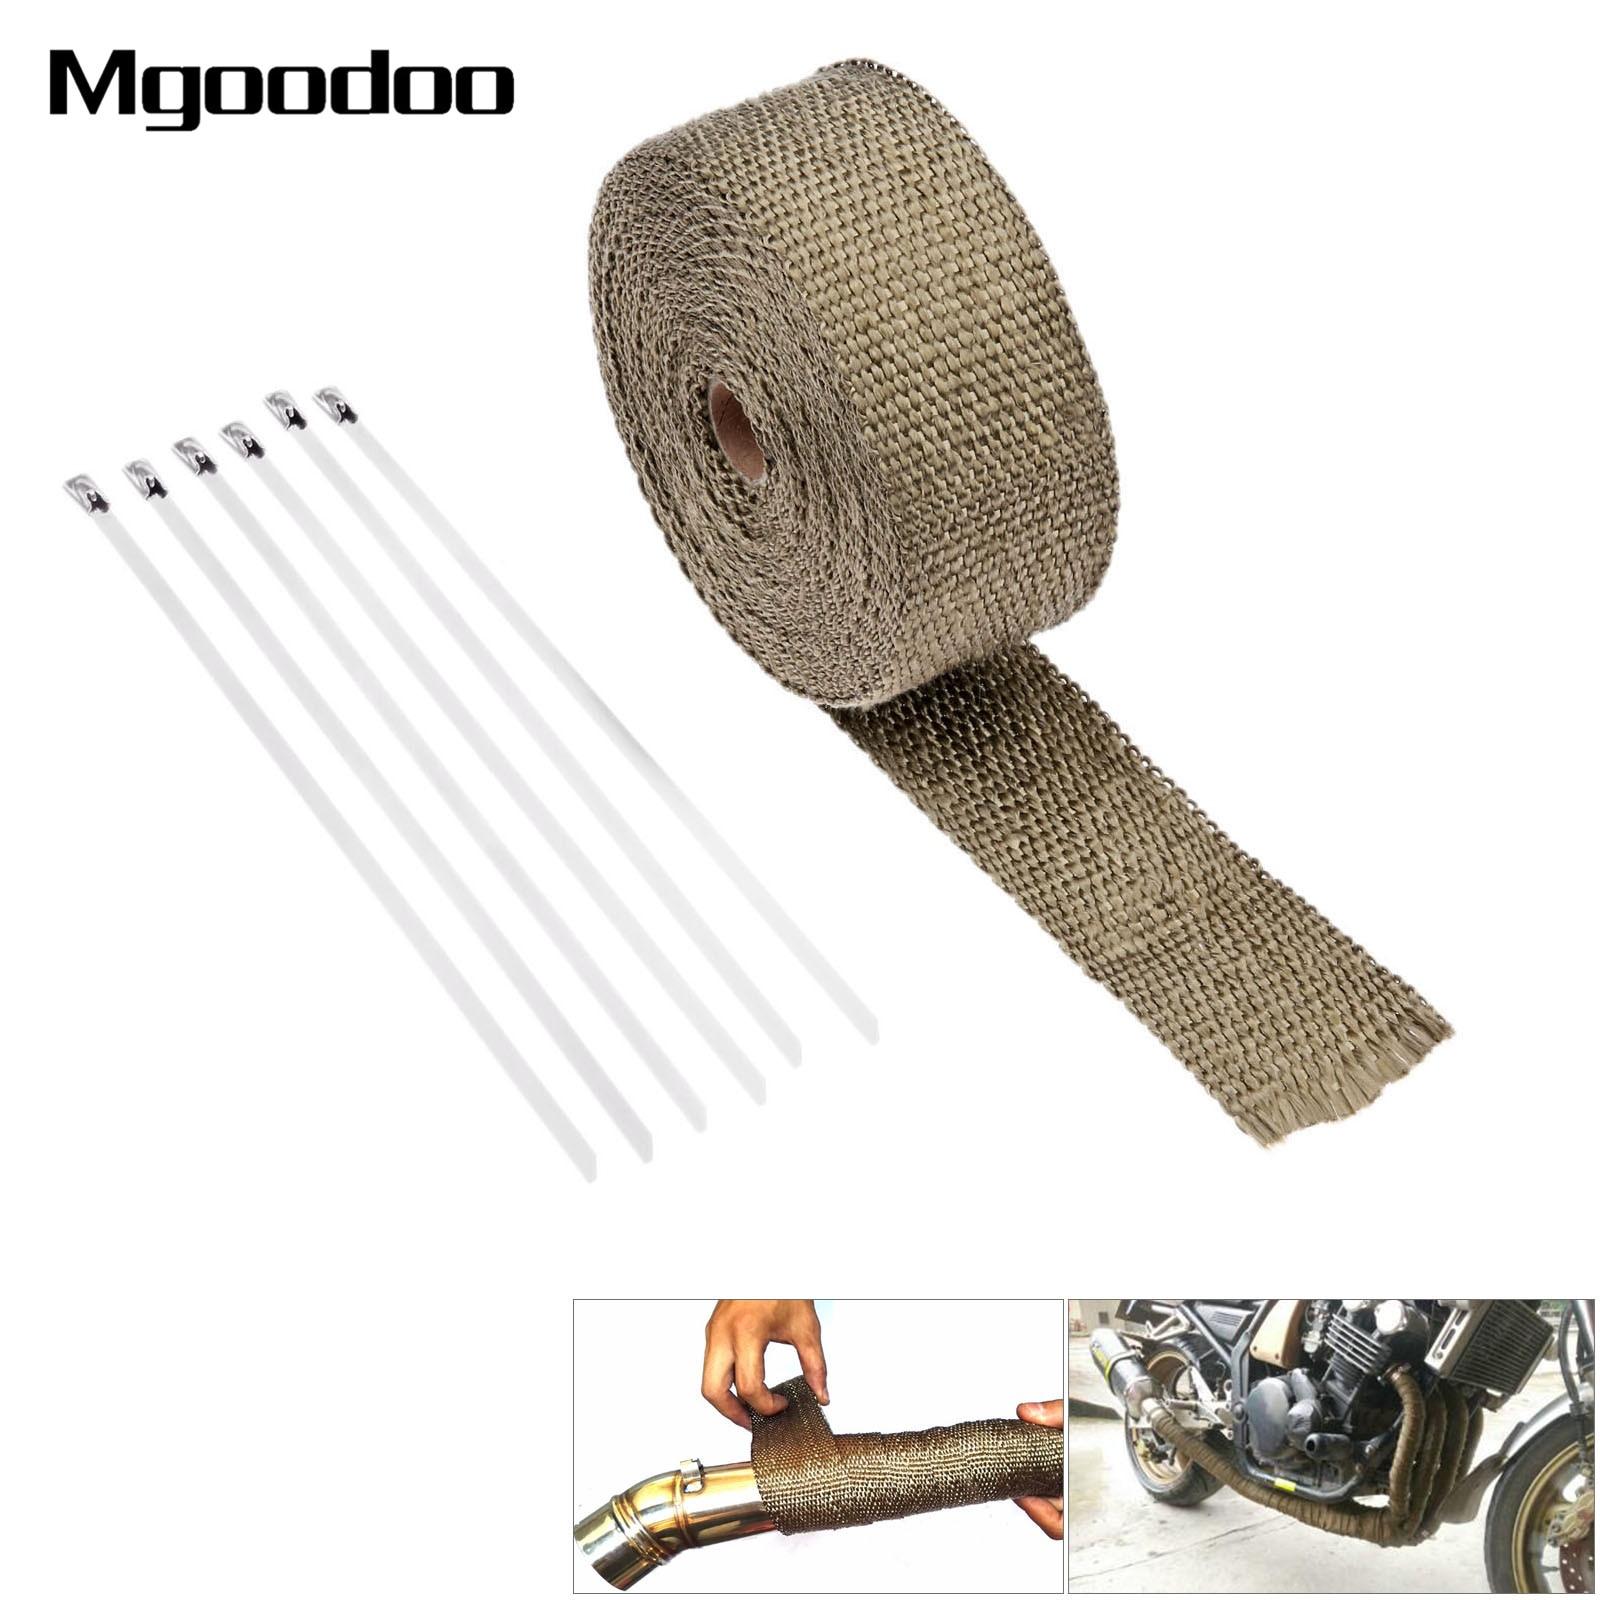 10M Motorcycle Motocross Thermal Exhaust Pipe Header Heat Wrap Tape Resistant Durable Stainless Steel Ties Kit Titanium Gold